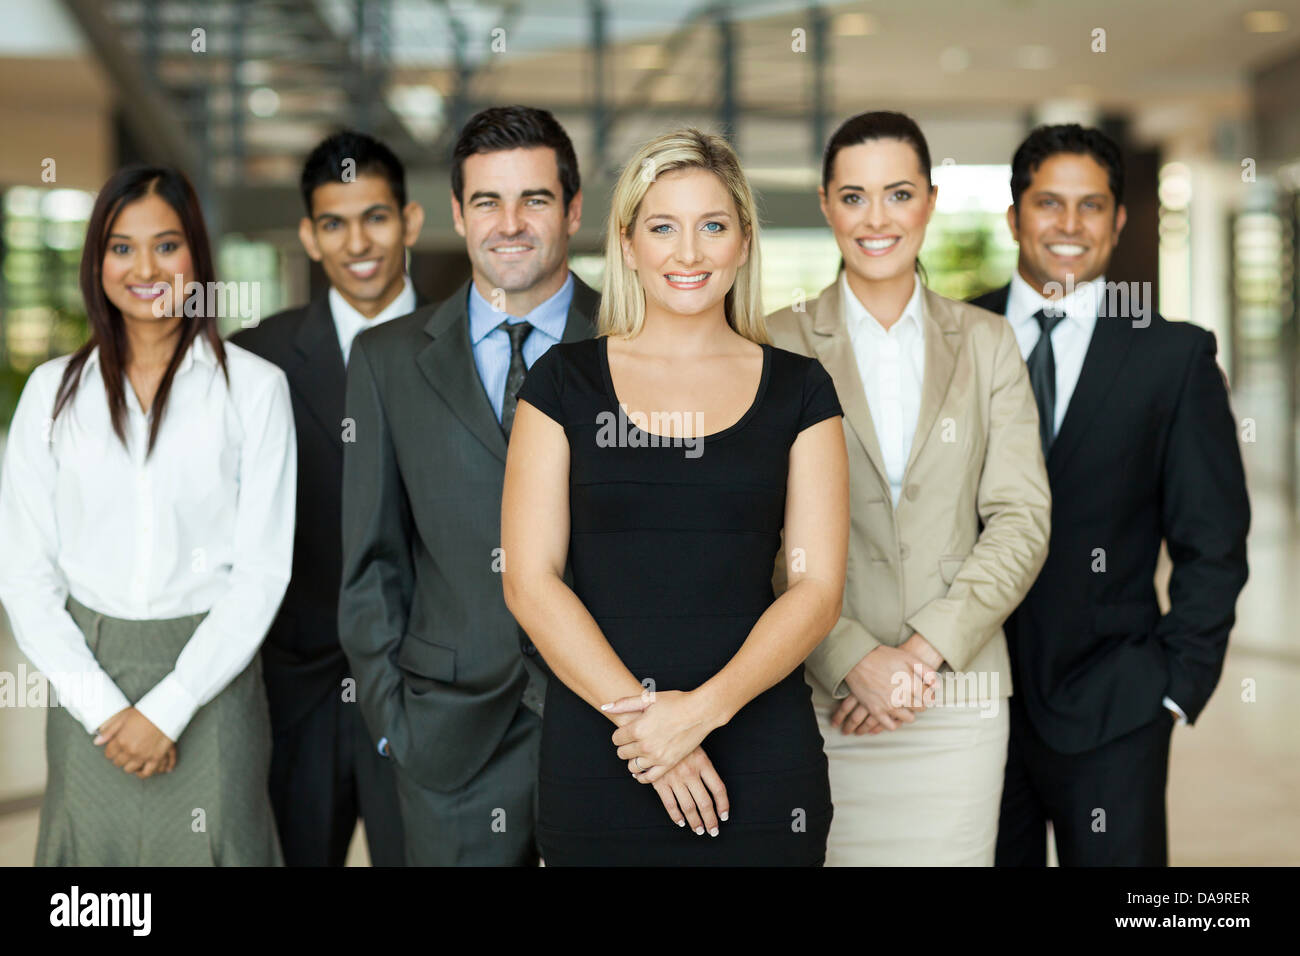 portrait of modern business team inside office building - Stock Image